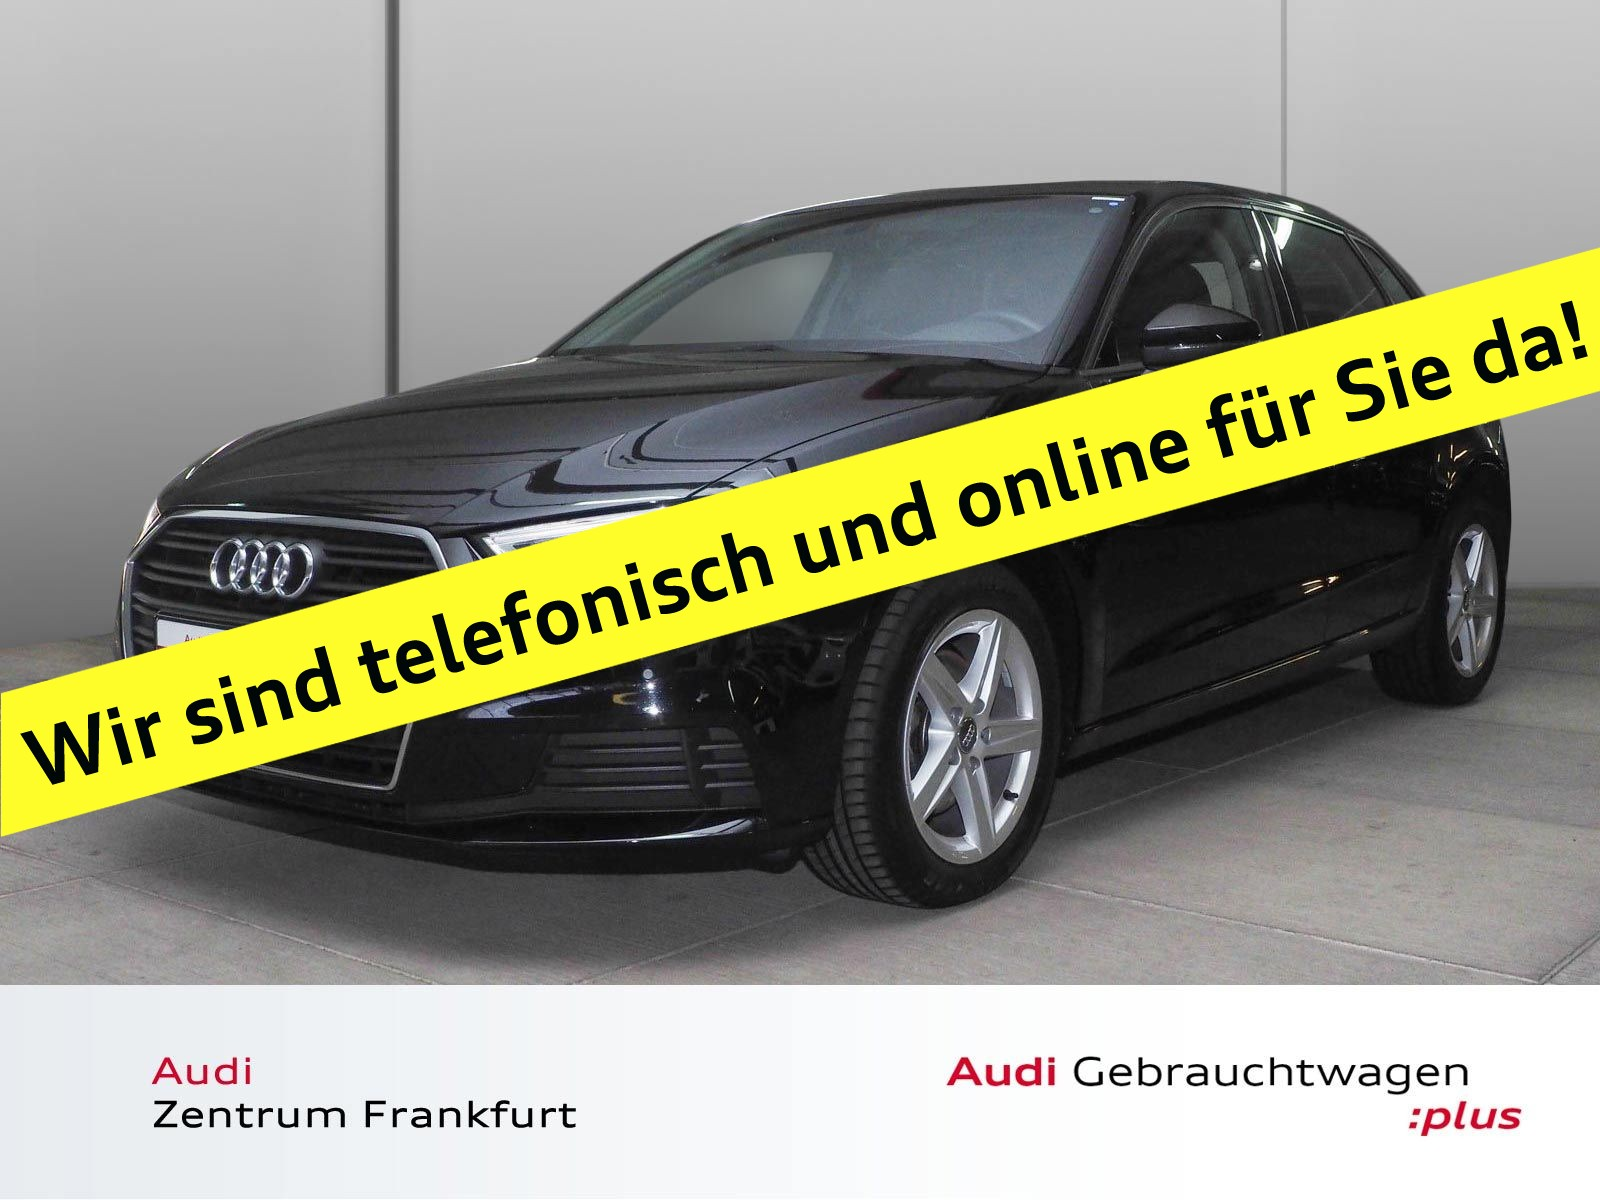 Audi A3 Sportback 30 TDI Xenon Navi PDC Tempomat, Jahr 2018, Diesel